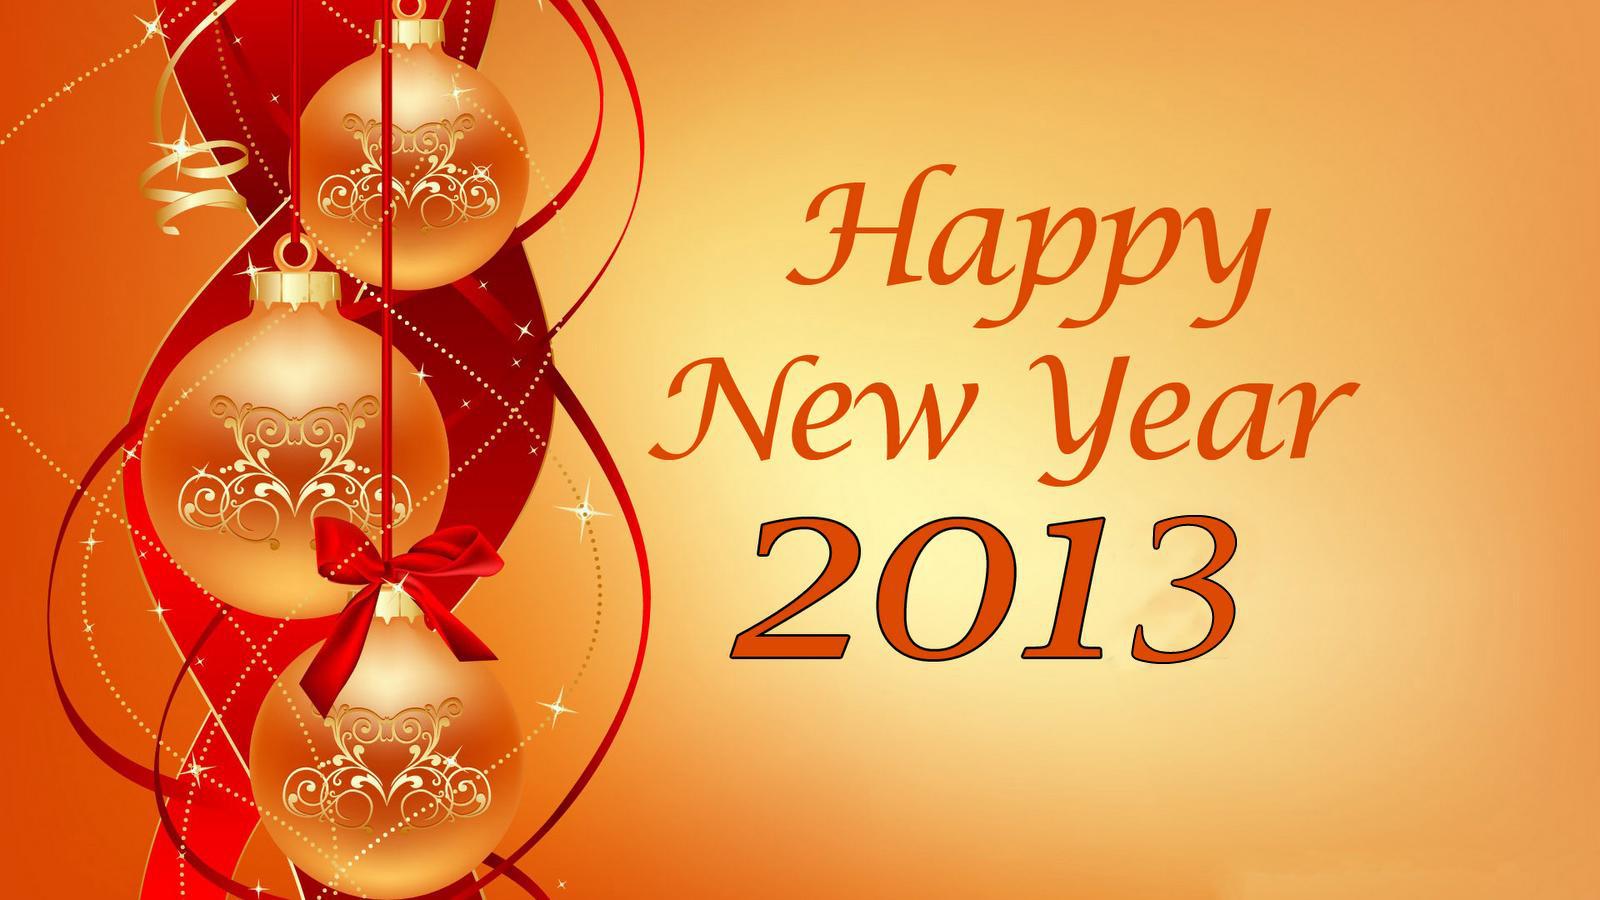 http://1.bp.blogspot.com/-Ru1FDLUHjxA/UMlhaobWIBI/AAAAAAAADeA/DGa_b0bdVVE/s1600/HD-new-year-free-wallpaper-2013.jpg